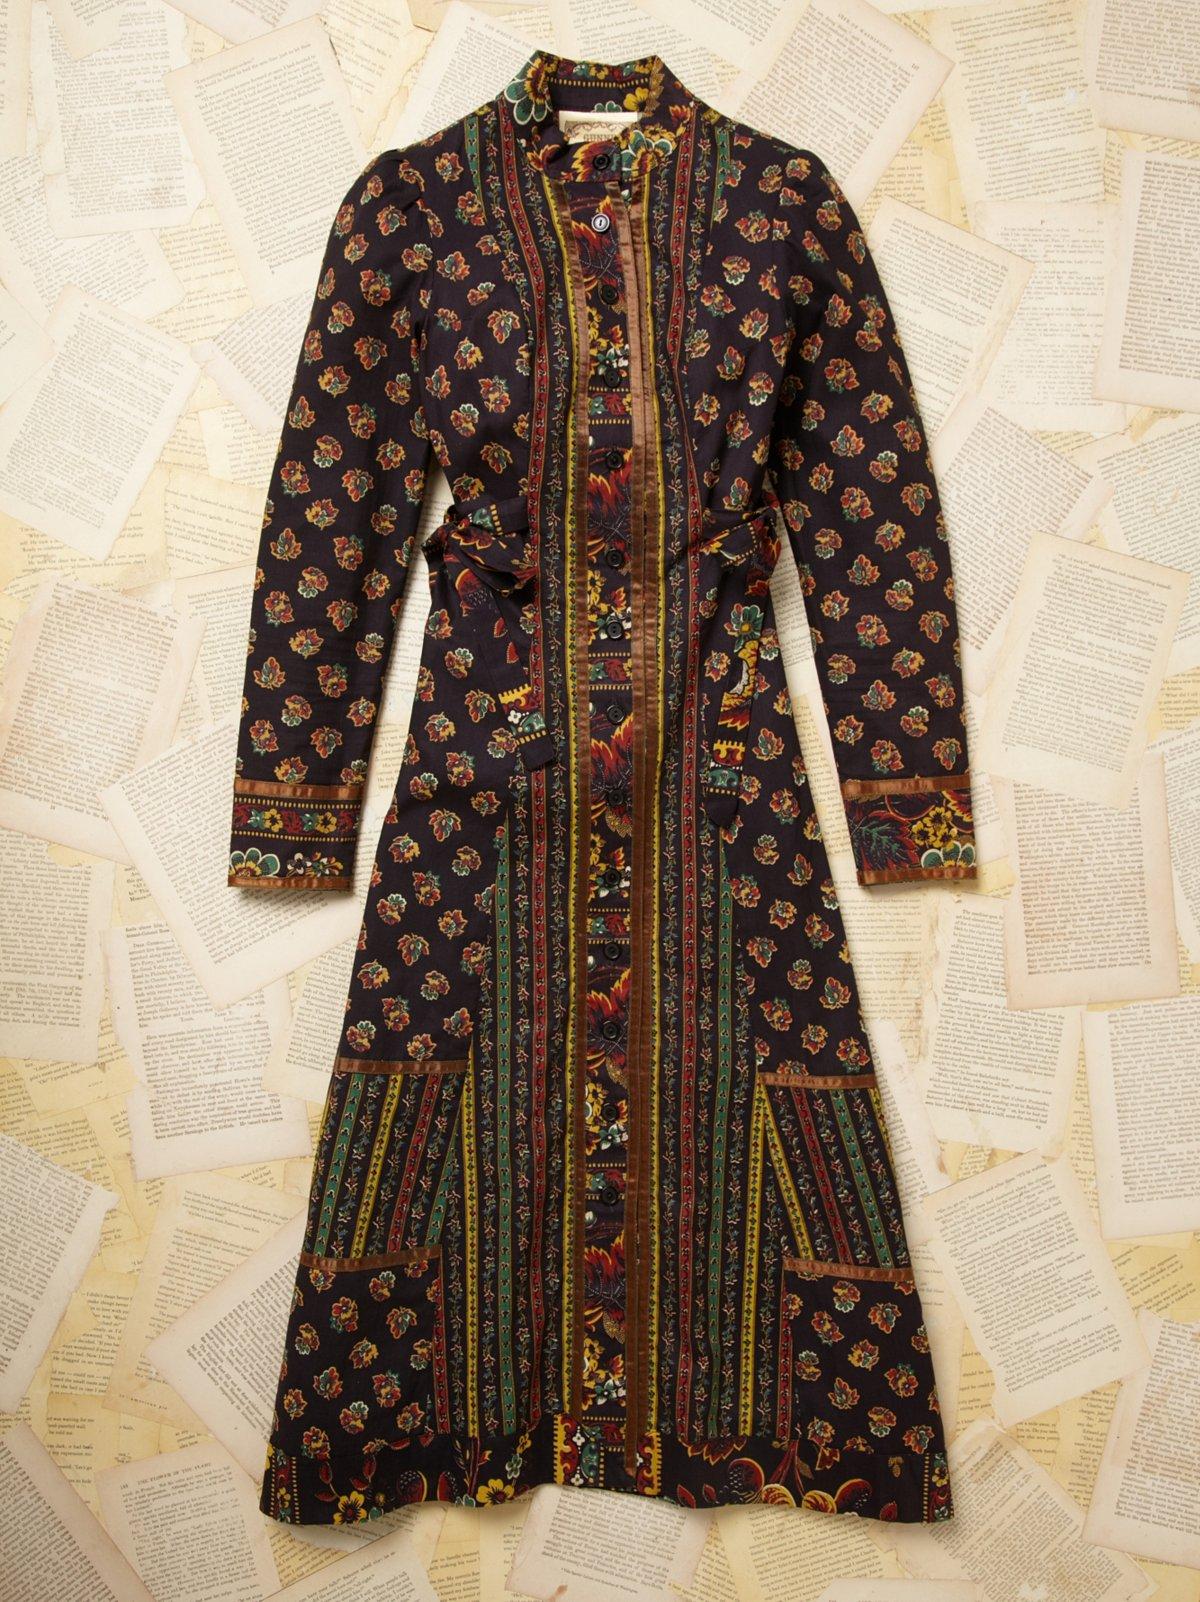 Vintage Gunne Sax for Saks Fifth Avenue Dress